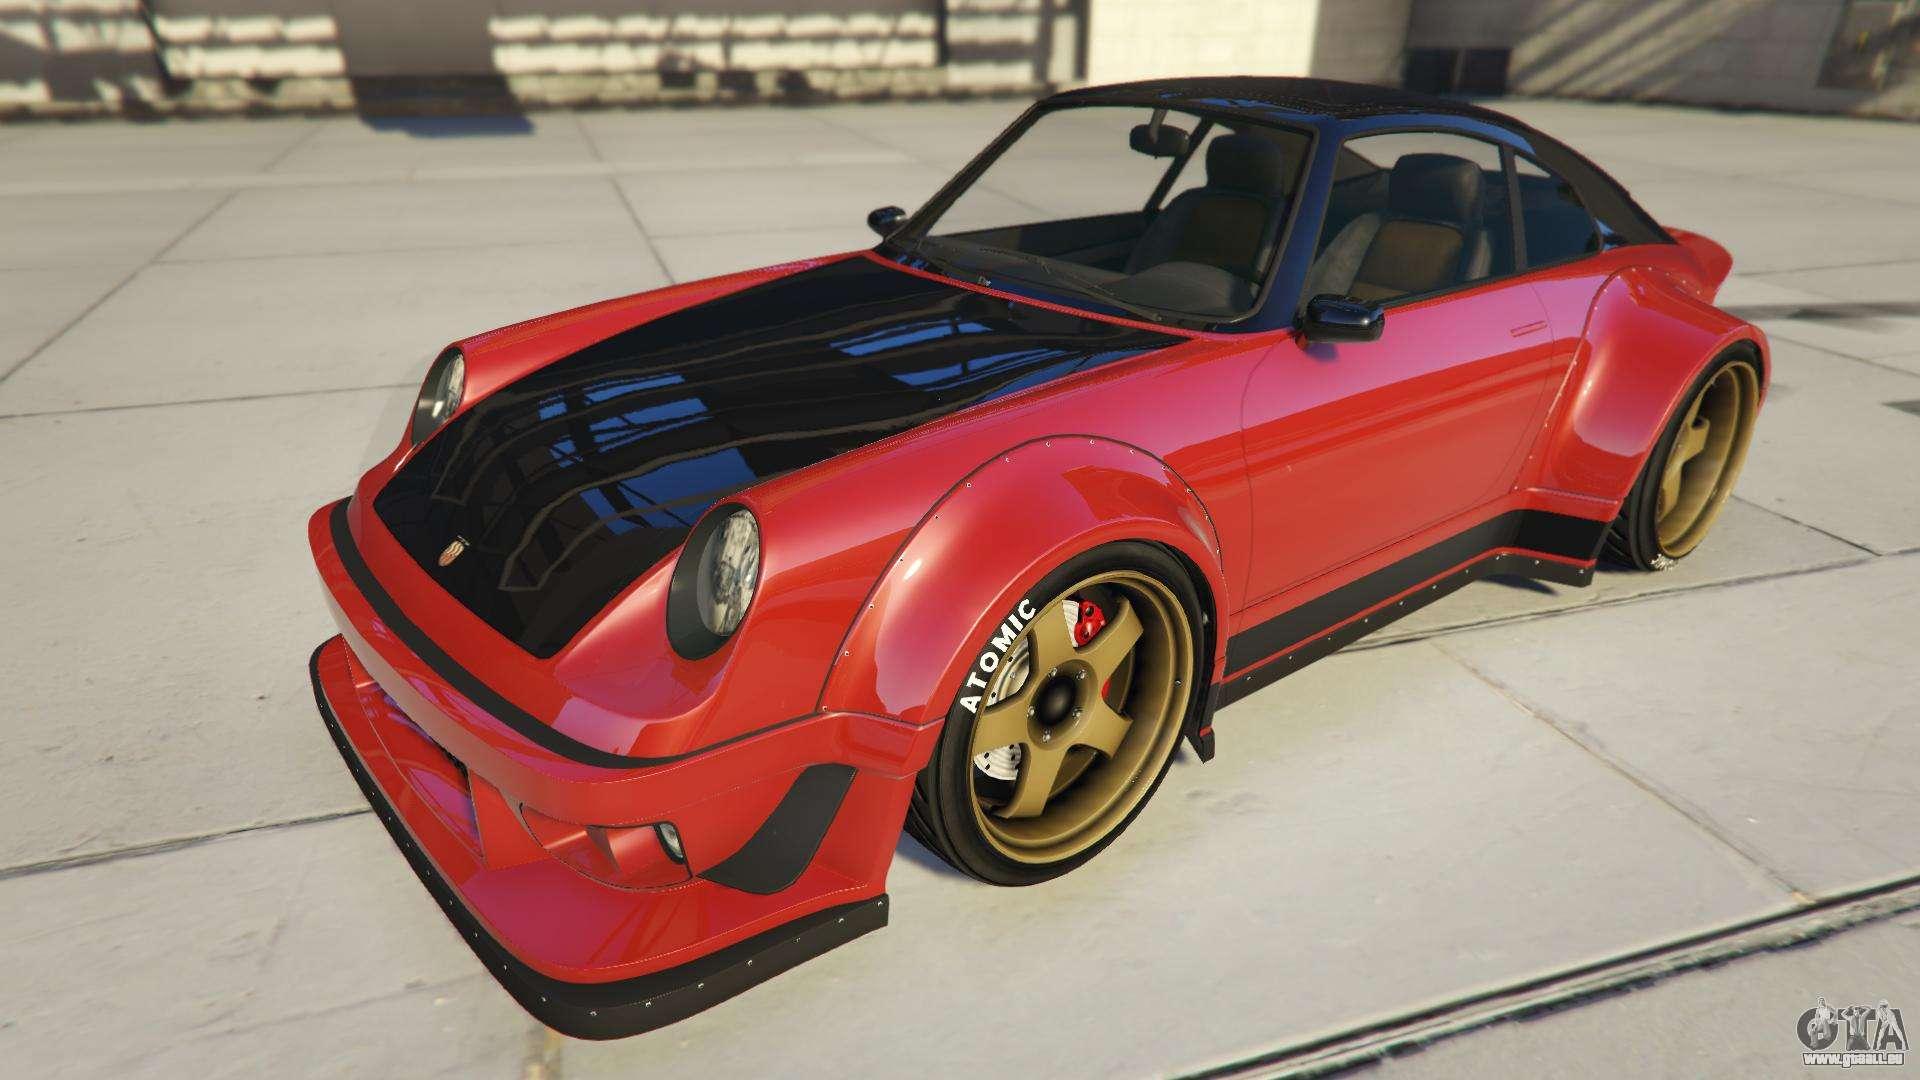 Pfister Comet Retro Custom de GTA Online